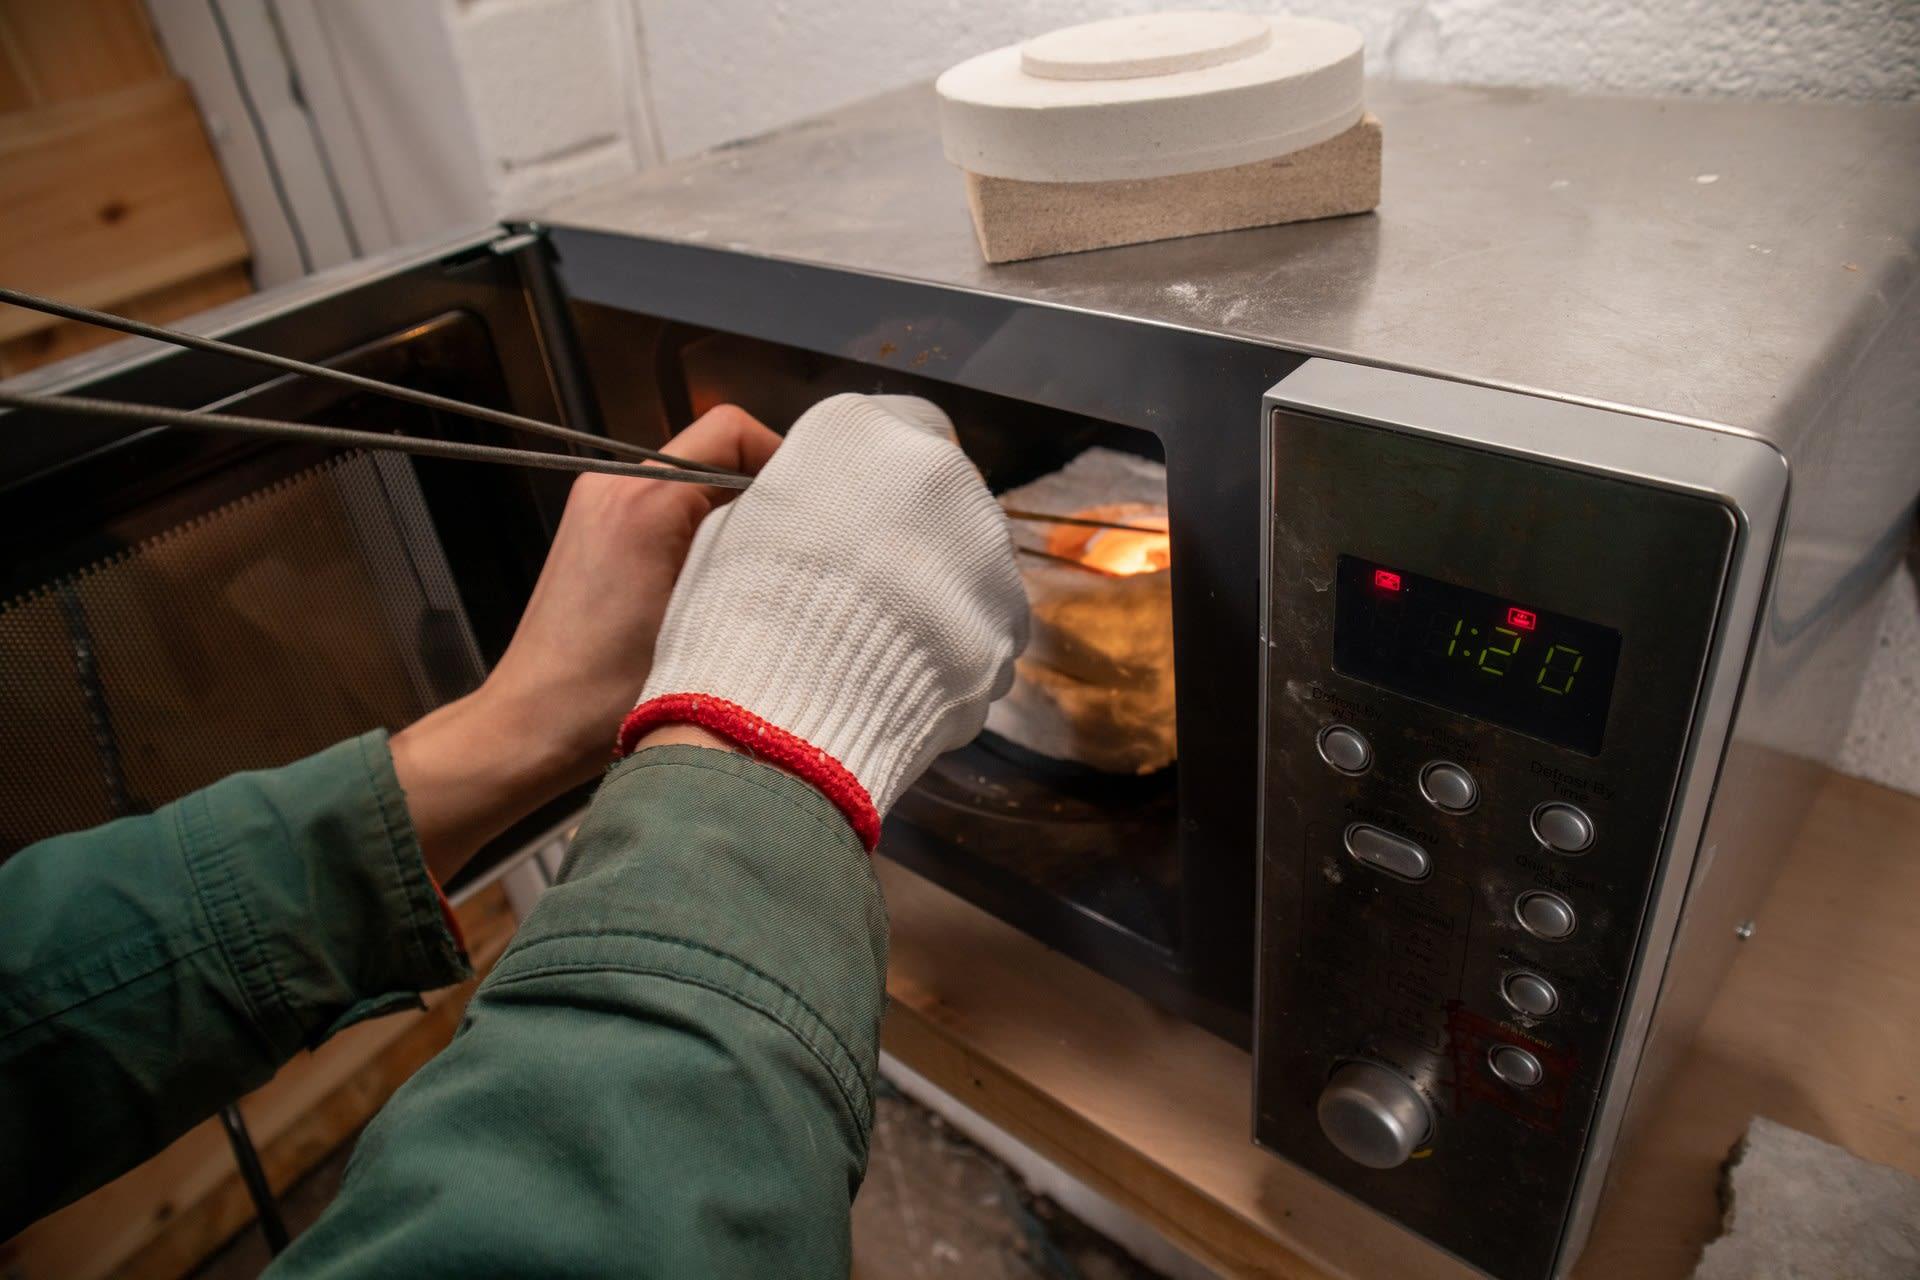 Microwave kiln